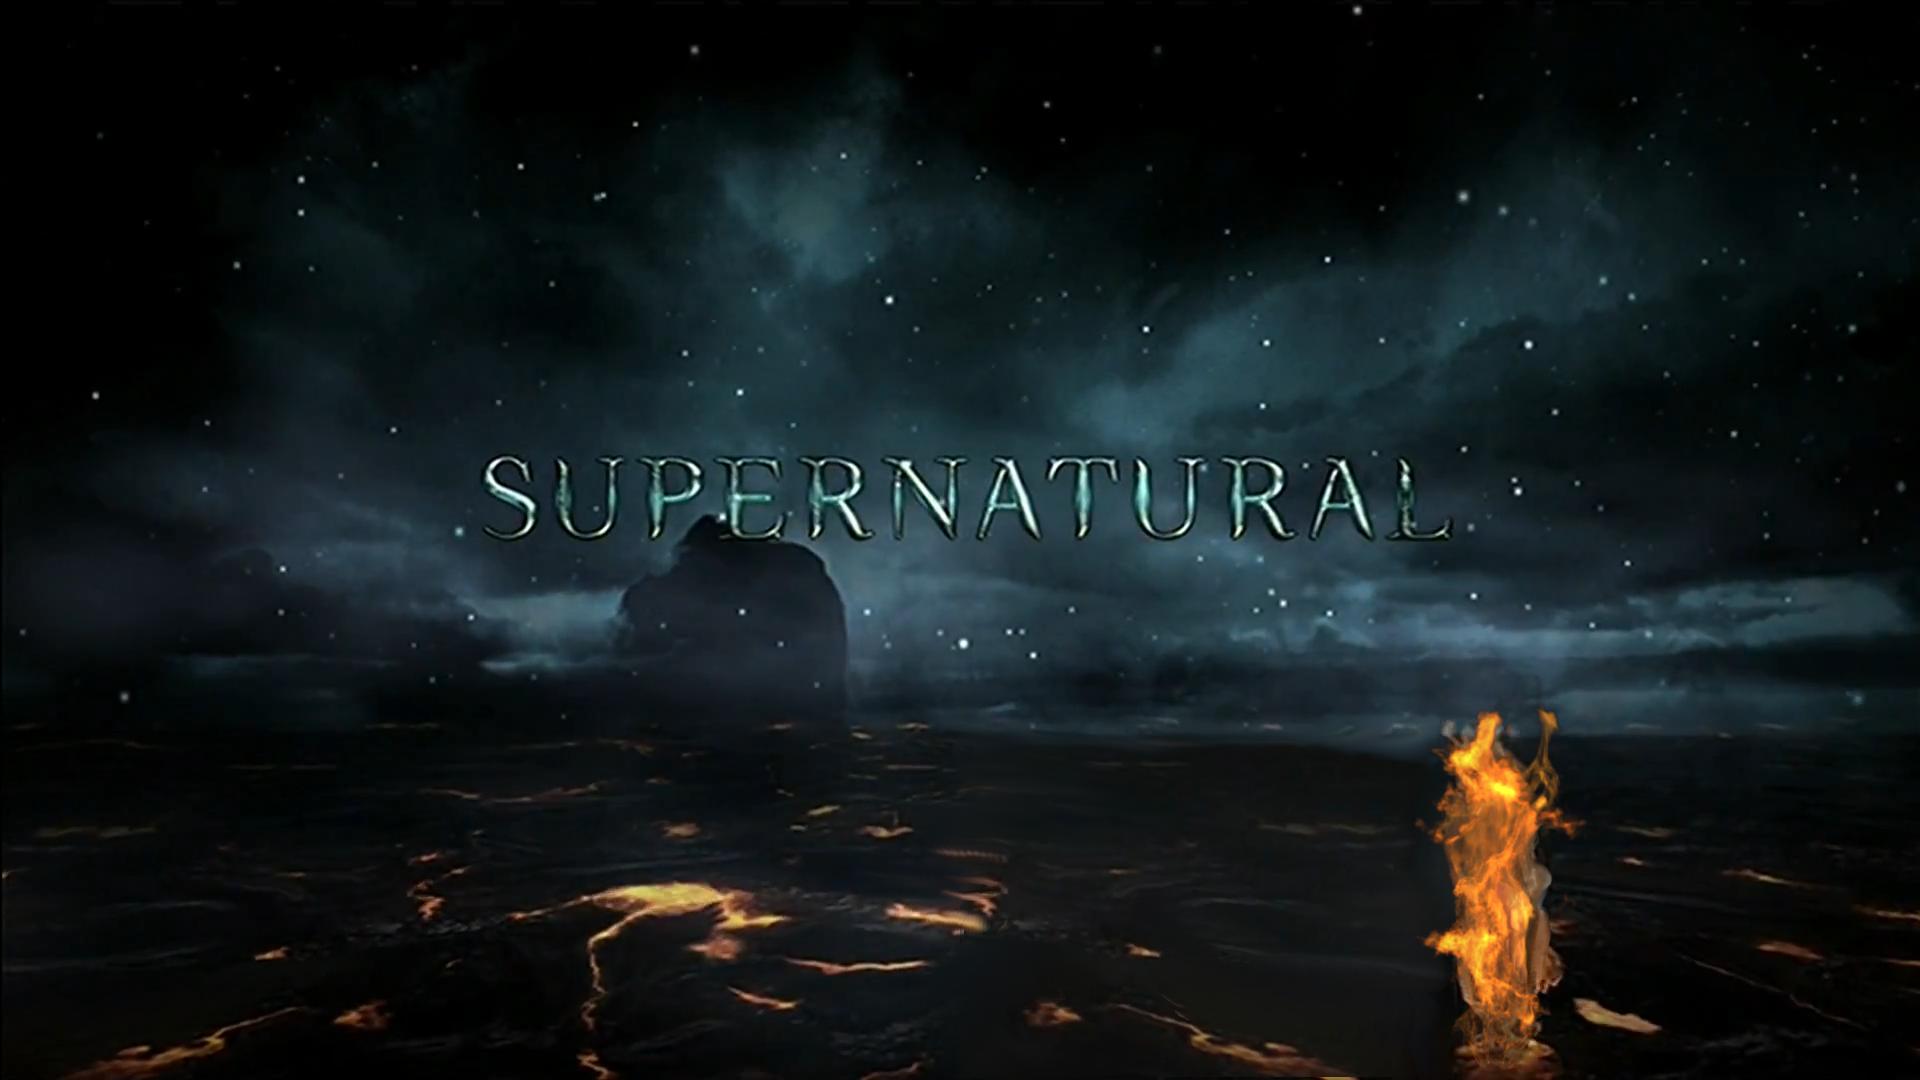 supernatural wallpapers free hd desktop wallpapers 4k hd